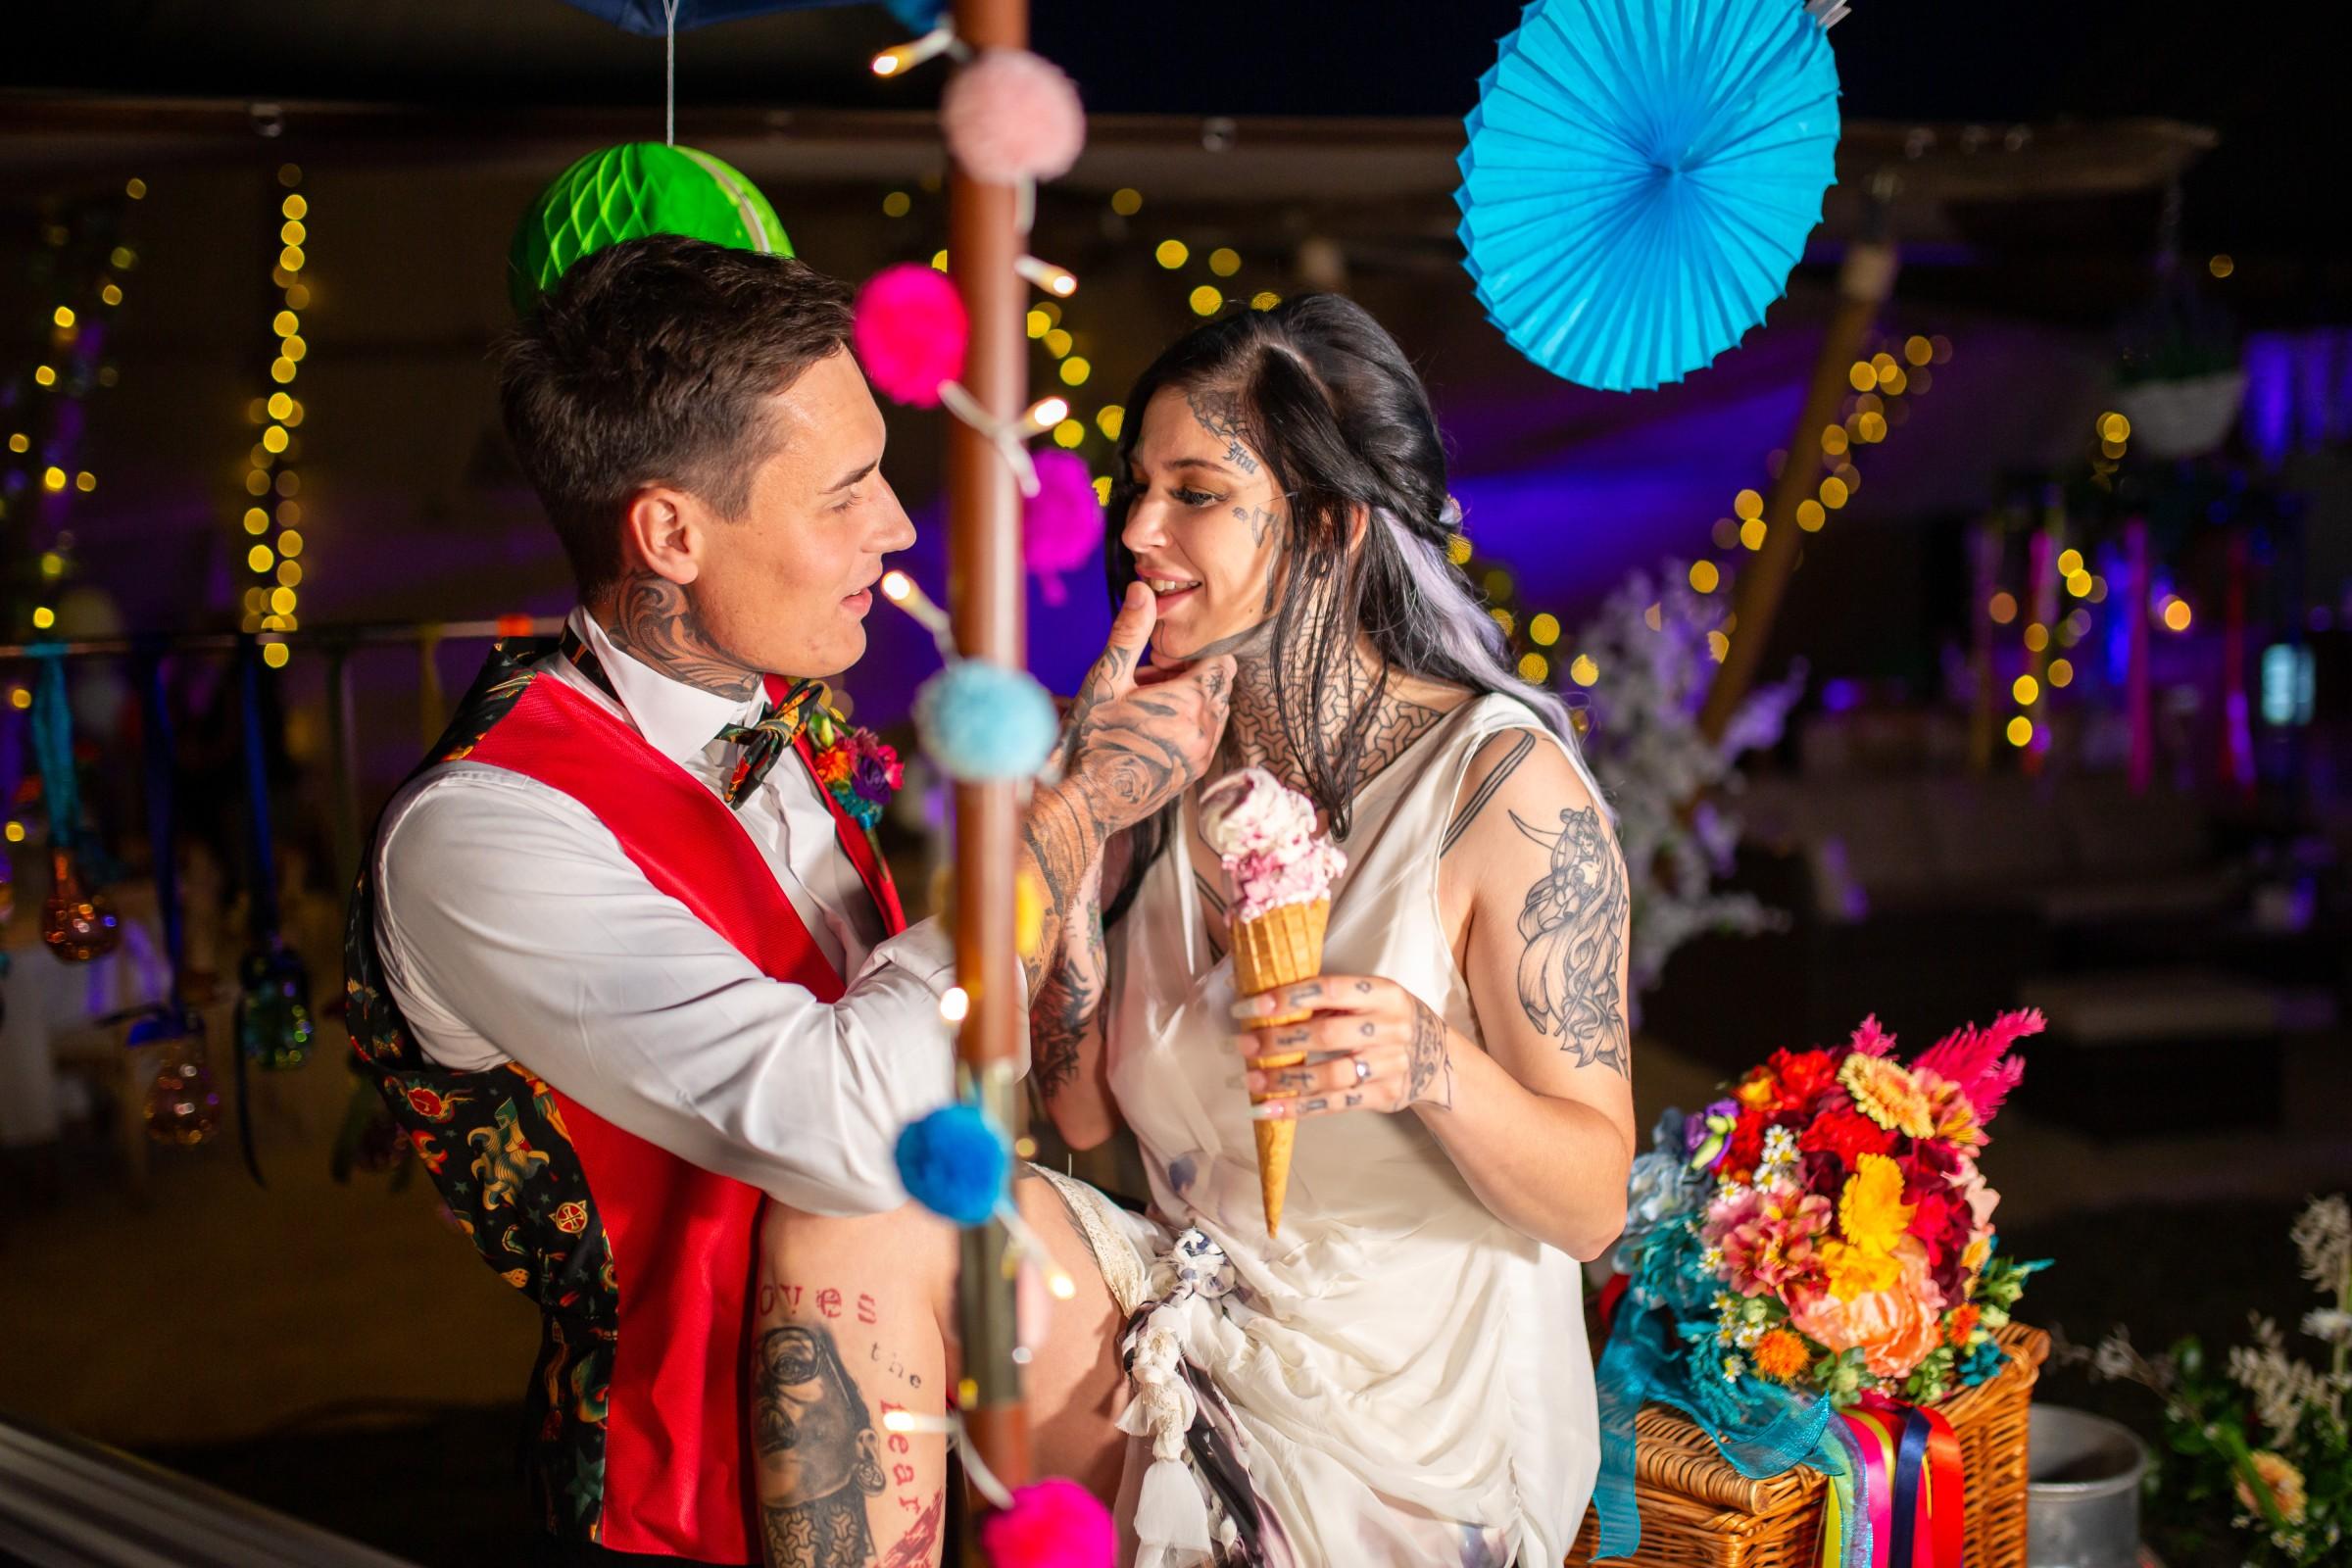 rainbow festival wedding - colourful wedding - quirky wedding ideas - bride and groom eating ice cream